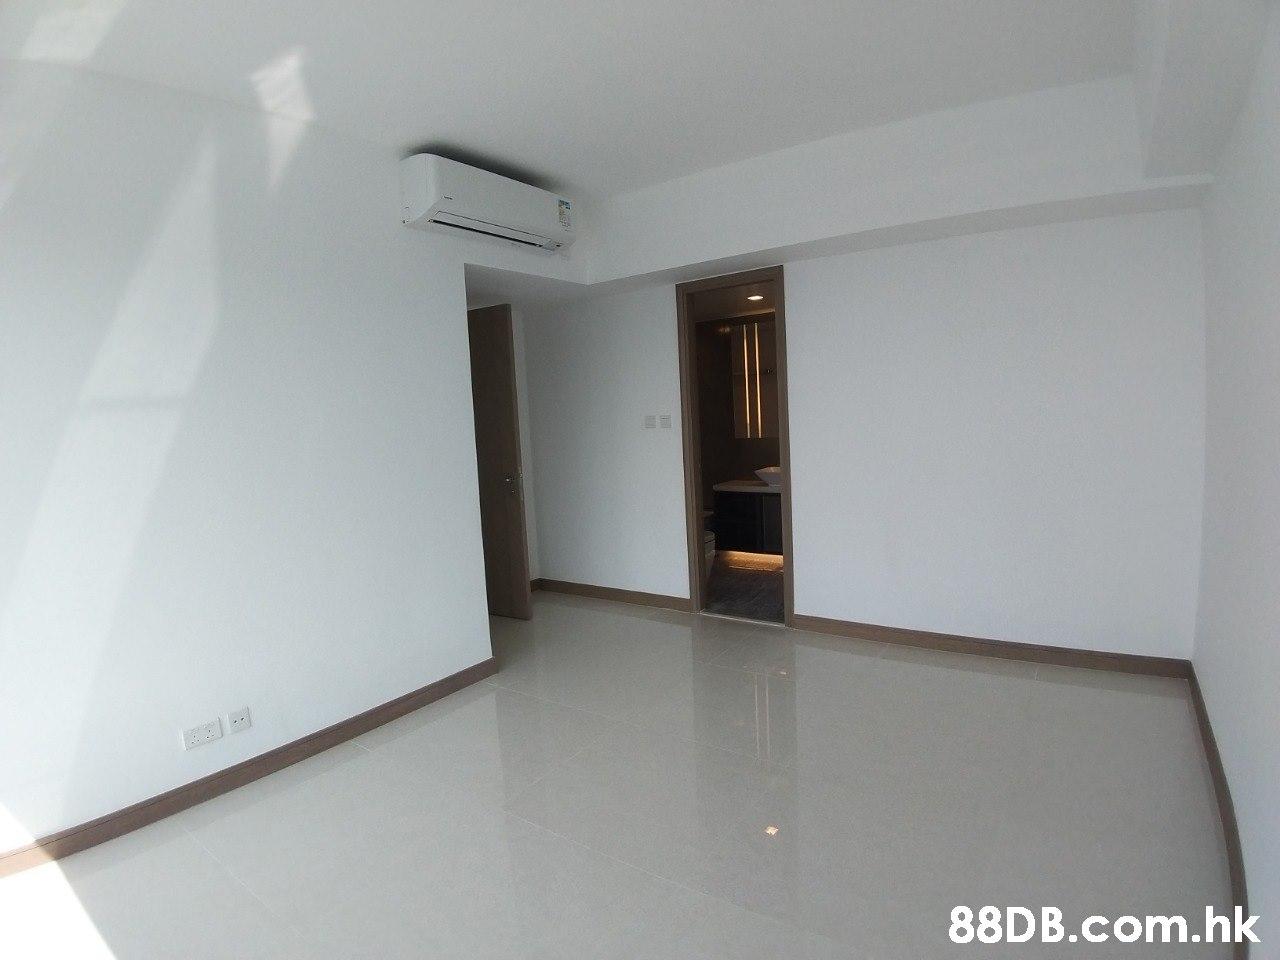 .hk  Property,Room,Floor,Ceiling,Building